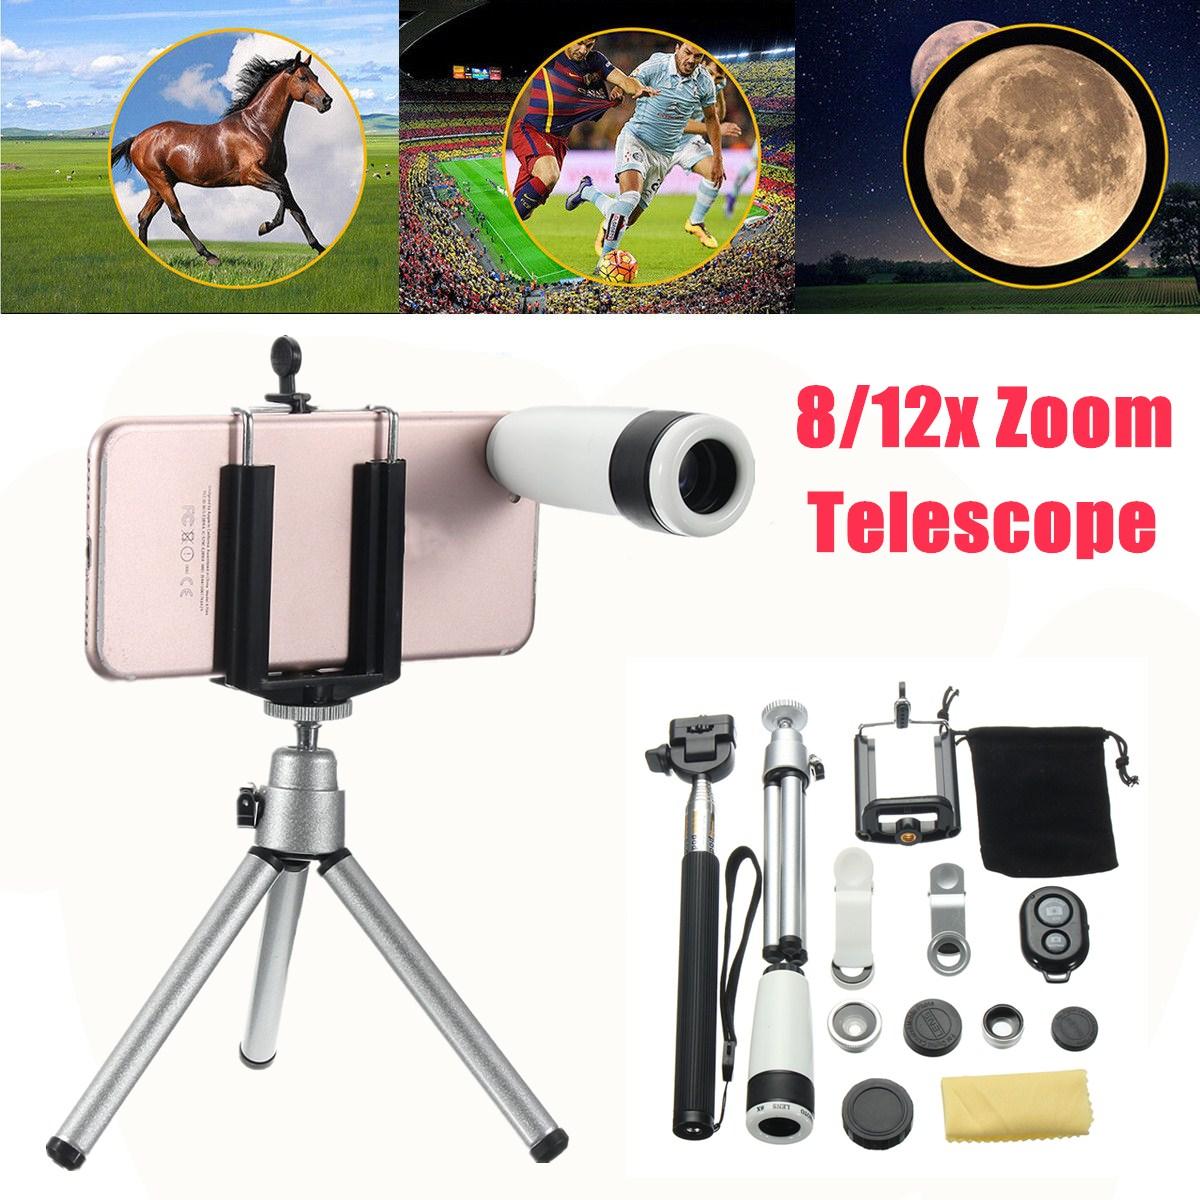 Telephoto Lens Camera Lens Kit-10 in 1 12x Magnification Phone Lens Fisheye+Wide Angle+Macro+Telephoto Lens Kit For Mobile Smart Phone